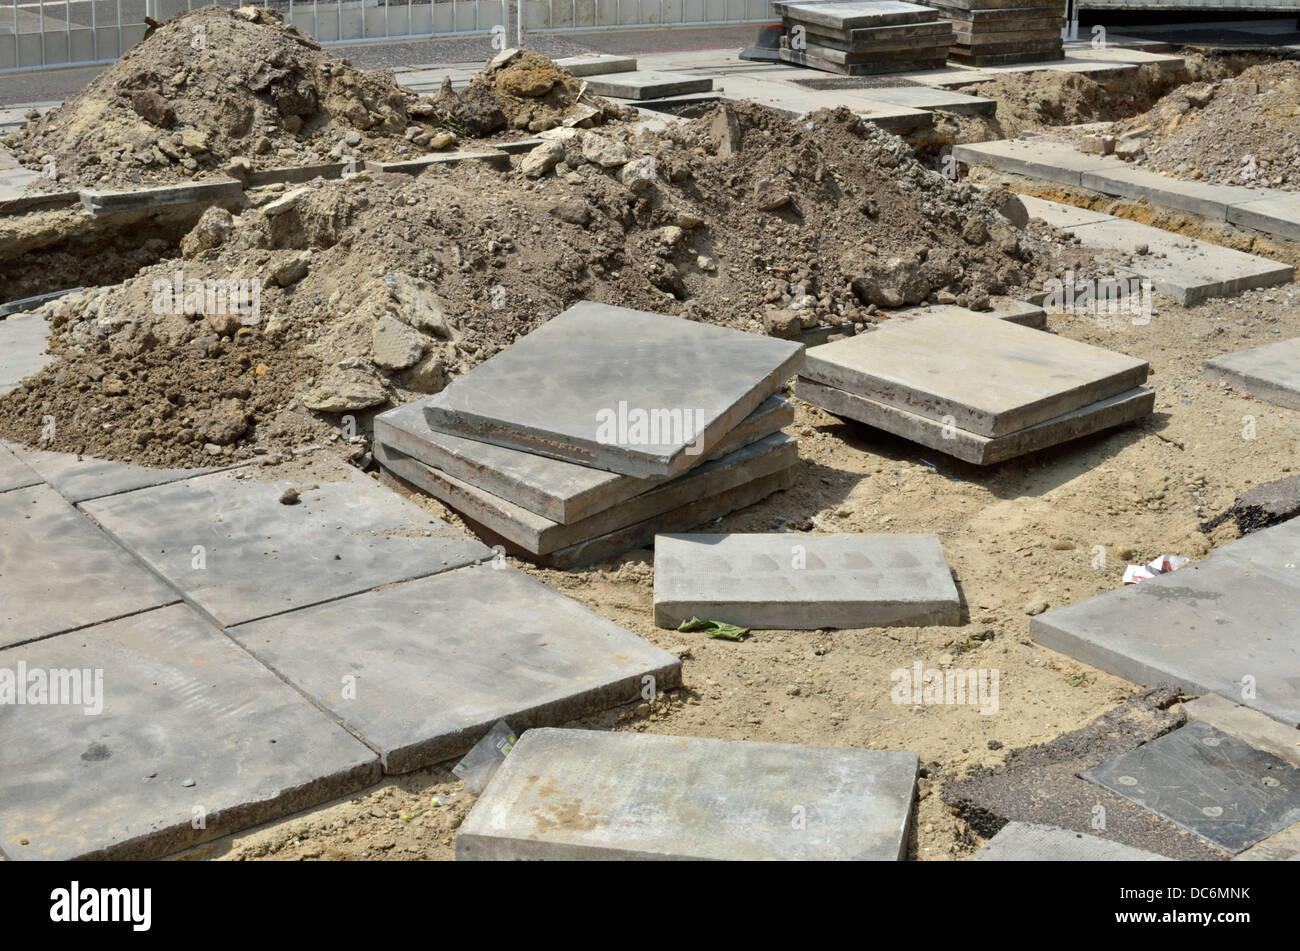 Work in progress on laying a new pavement, London, UK - Stock Image